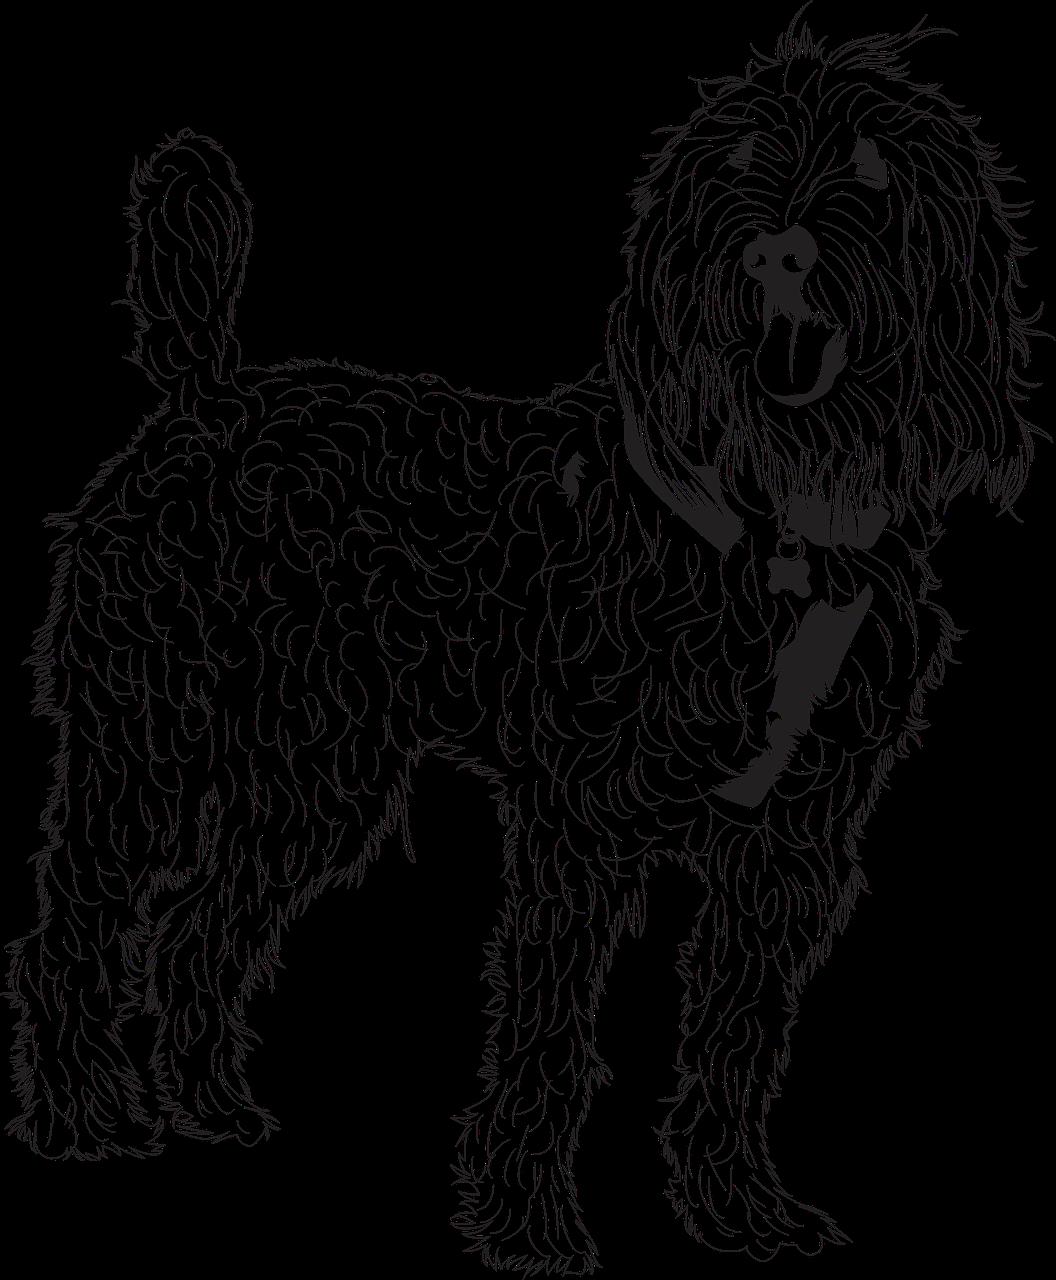 Doodle Golden Dog Free Vector Graphic On Pixabay